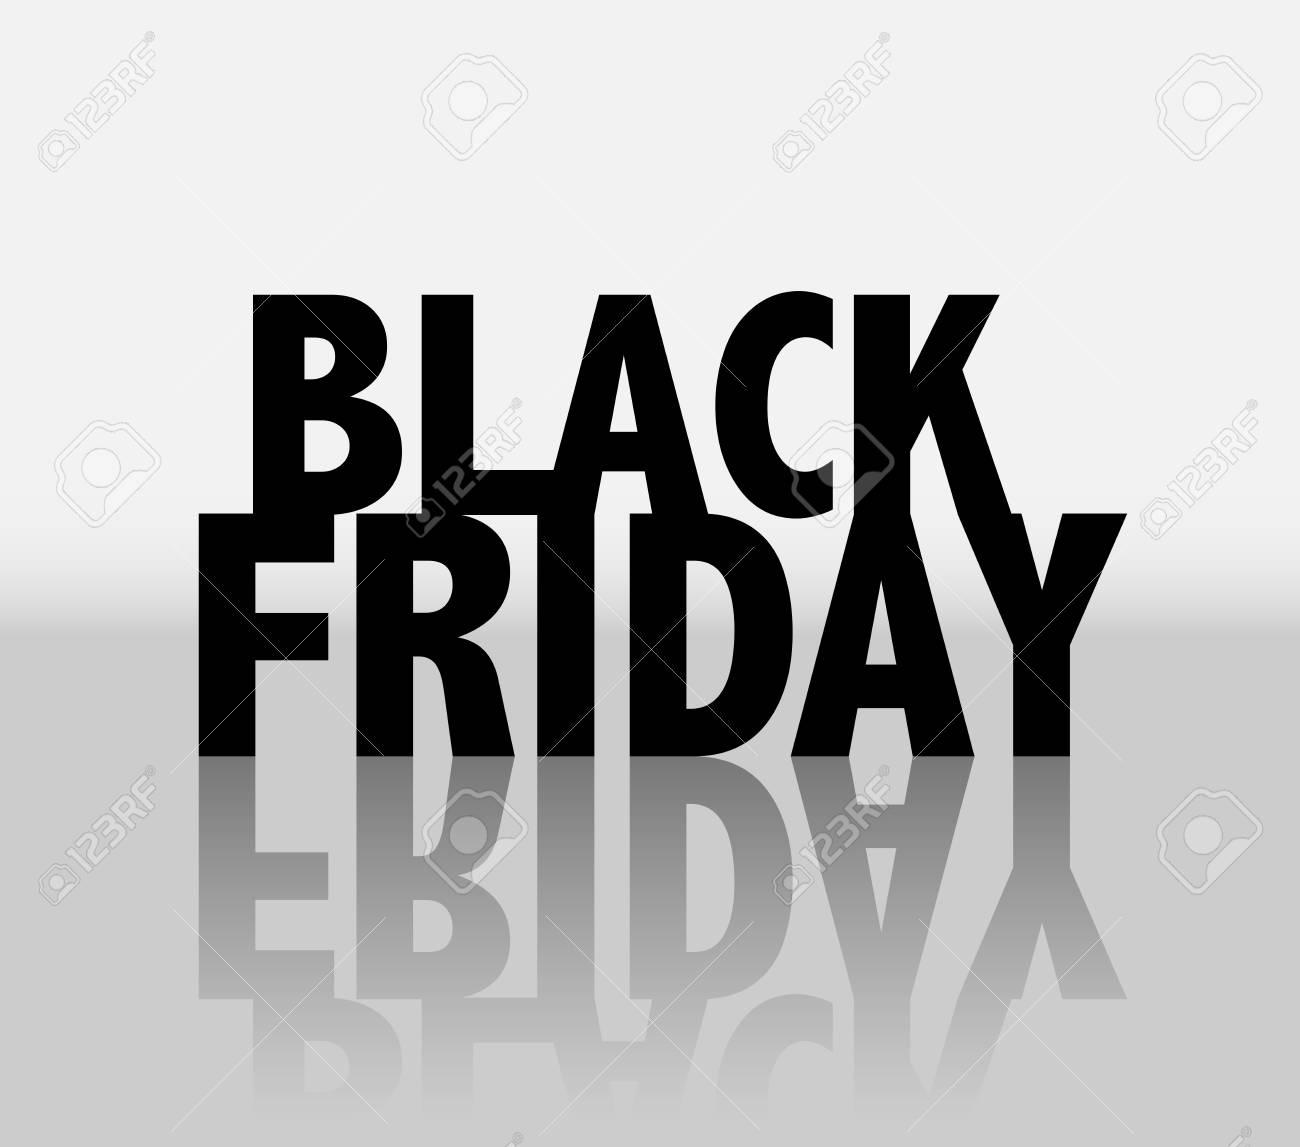 Black friday sale banner EPS10 Vector - 51756309